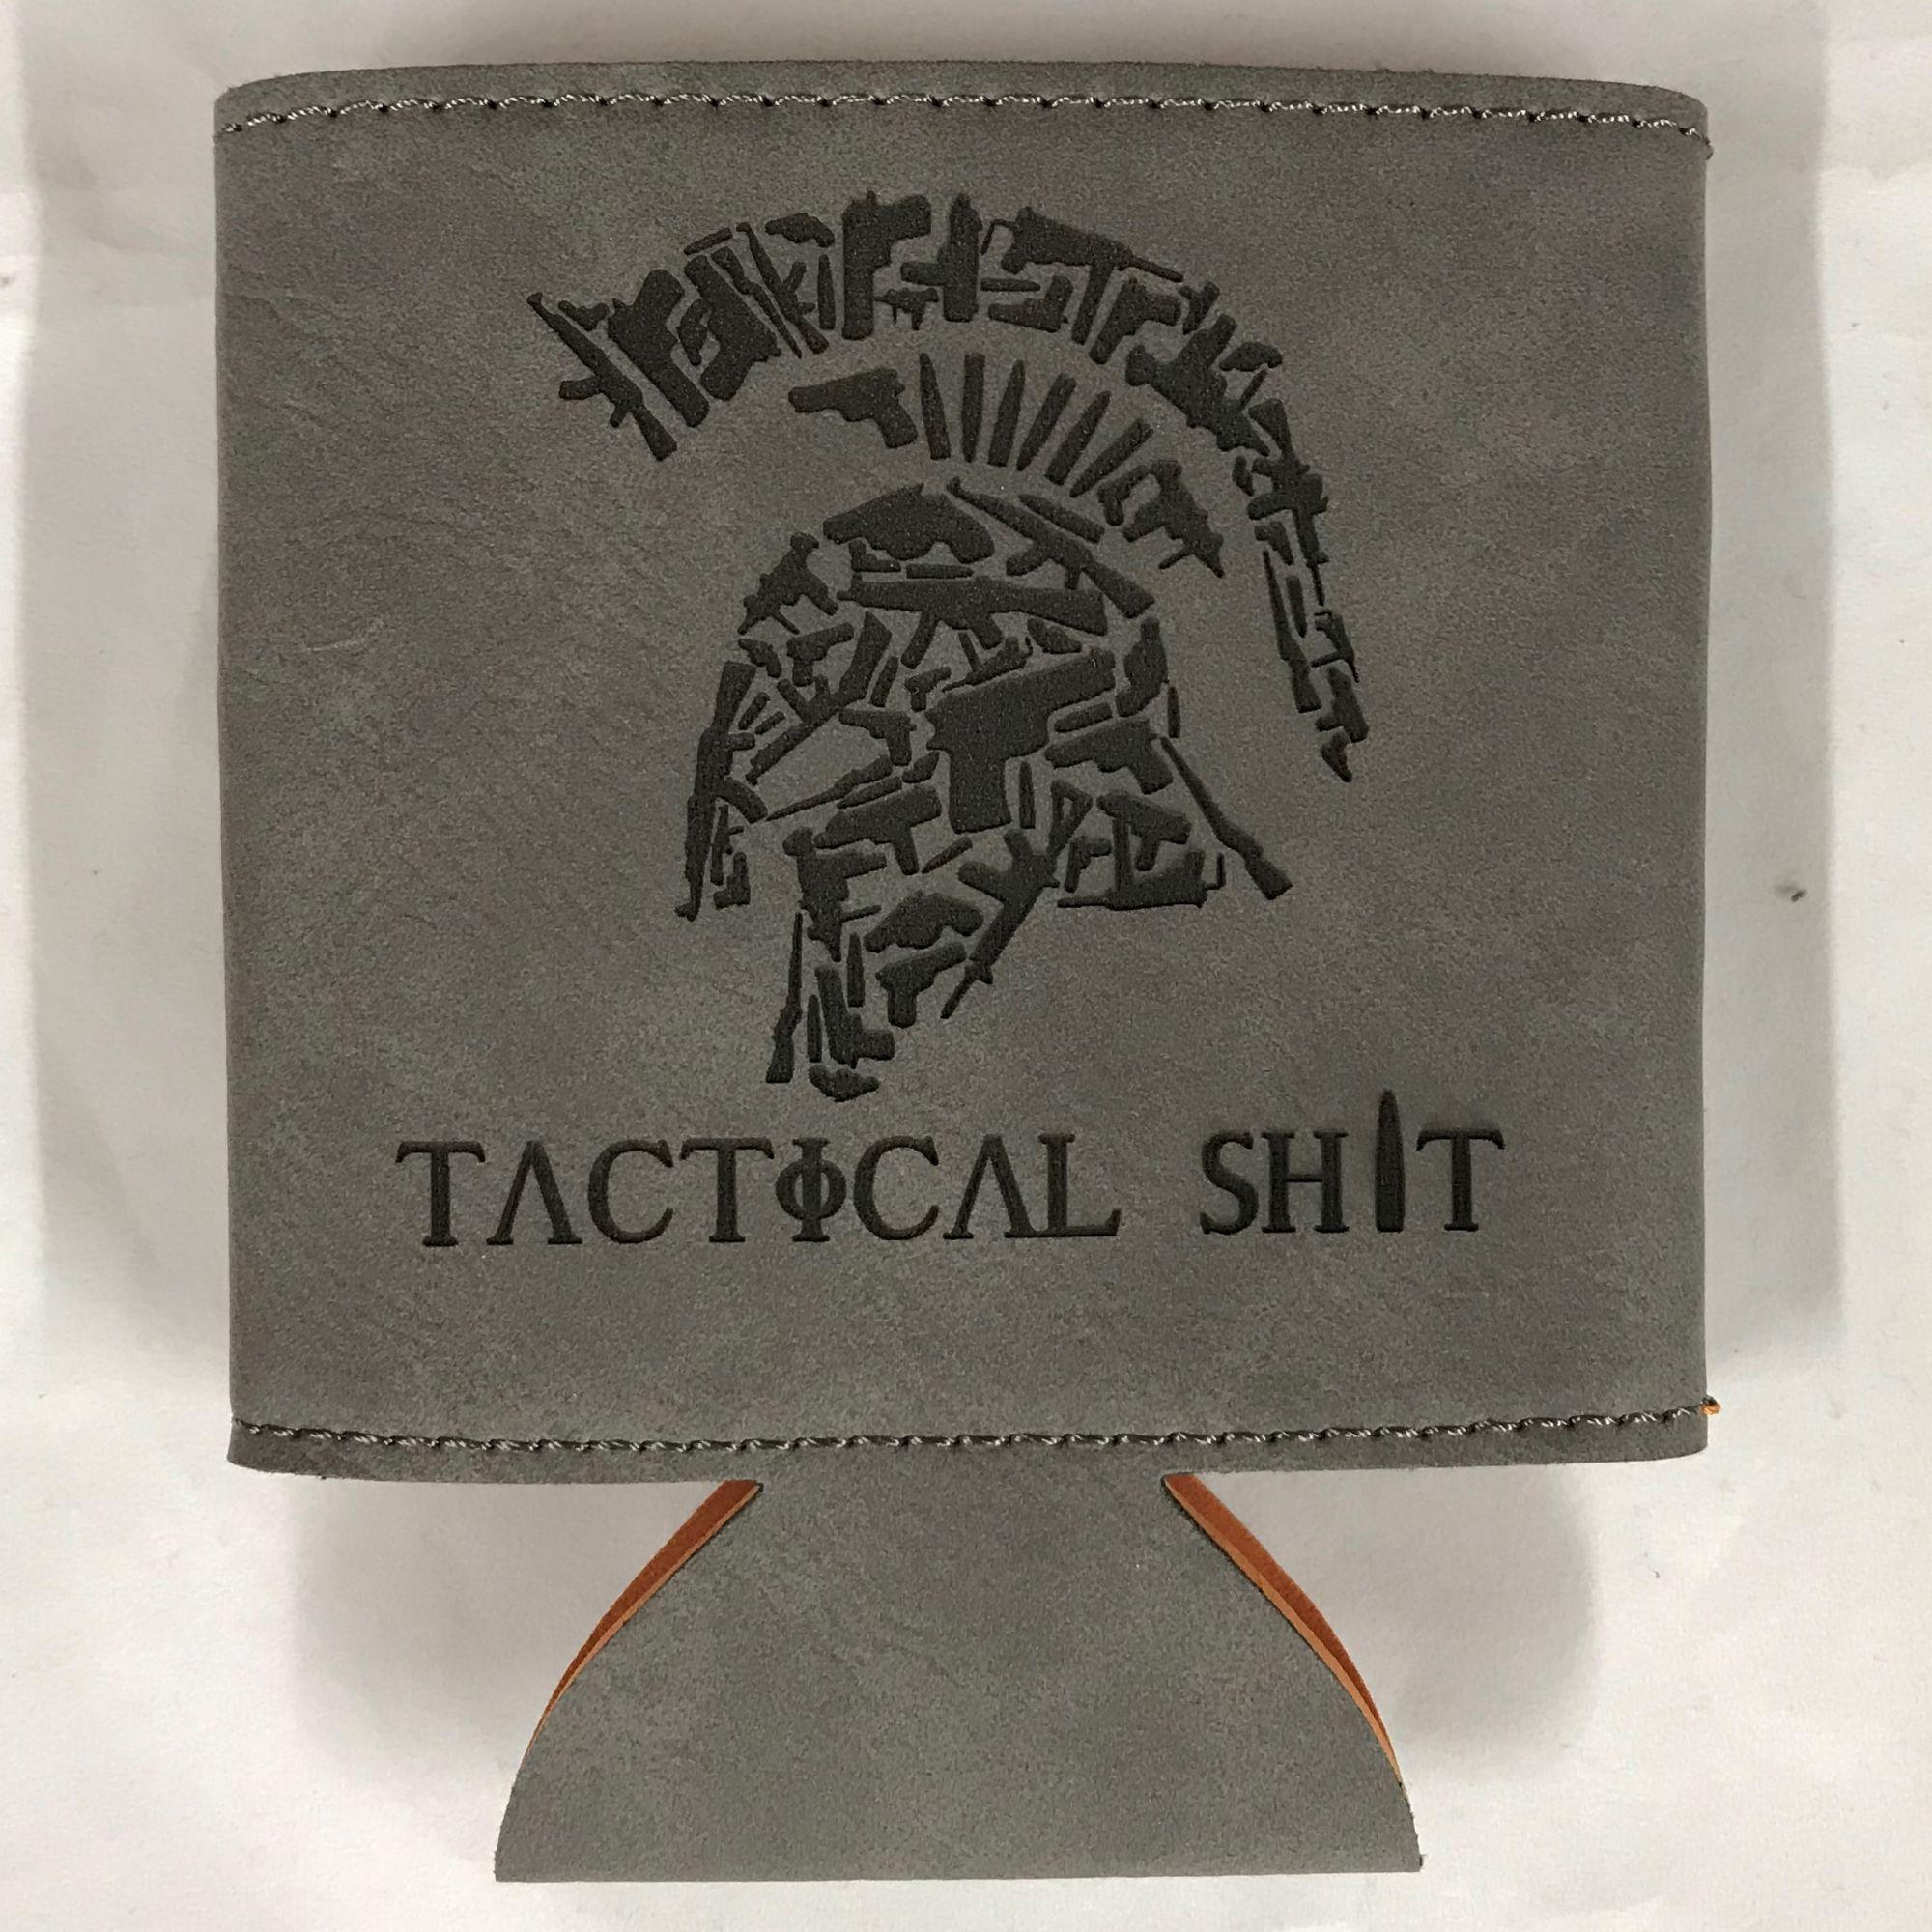 Tactical shit